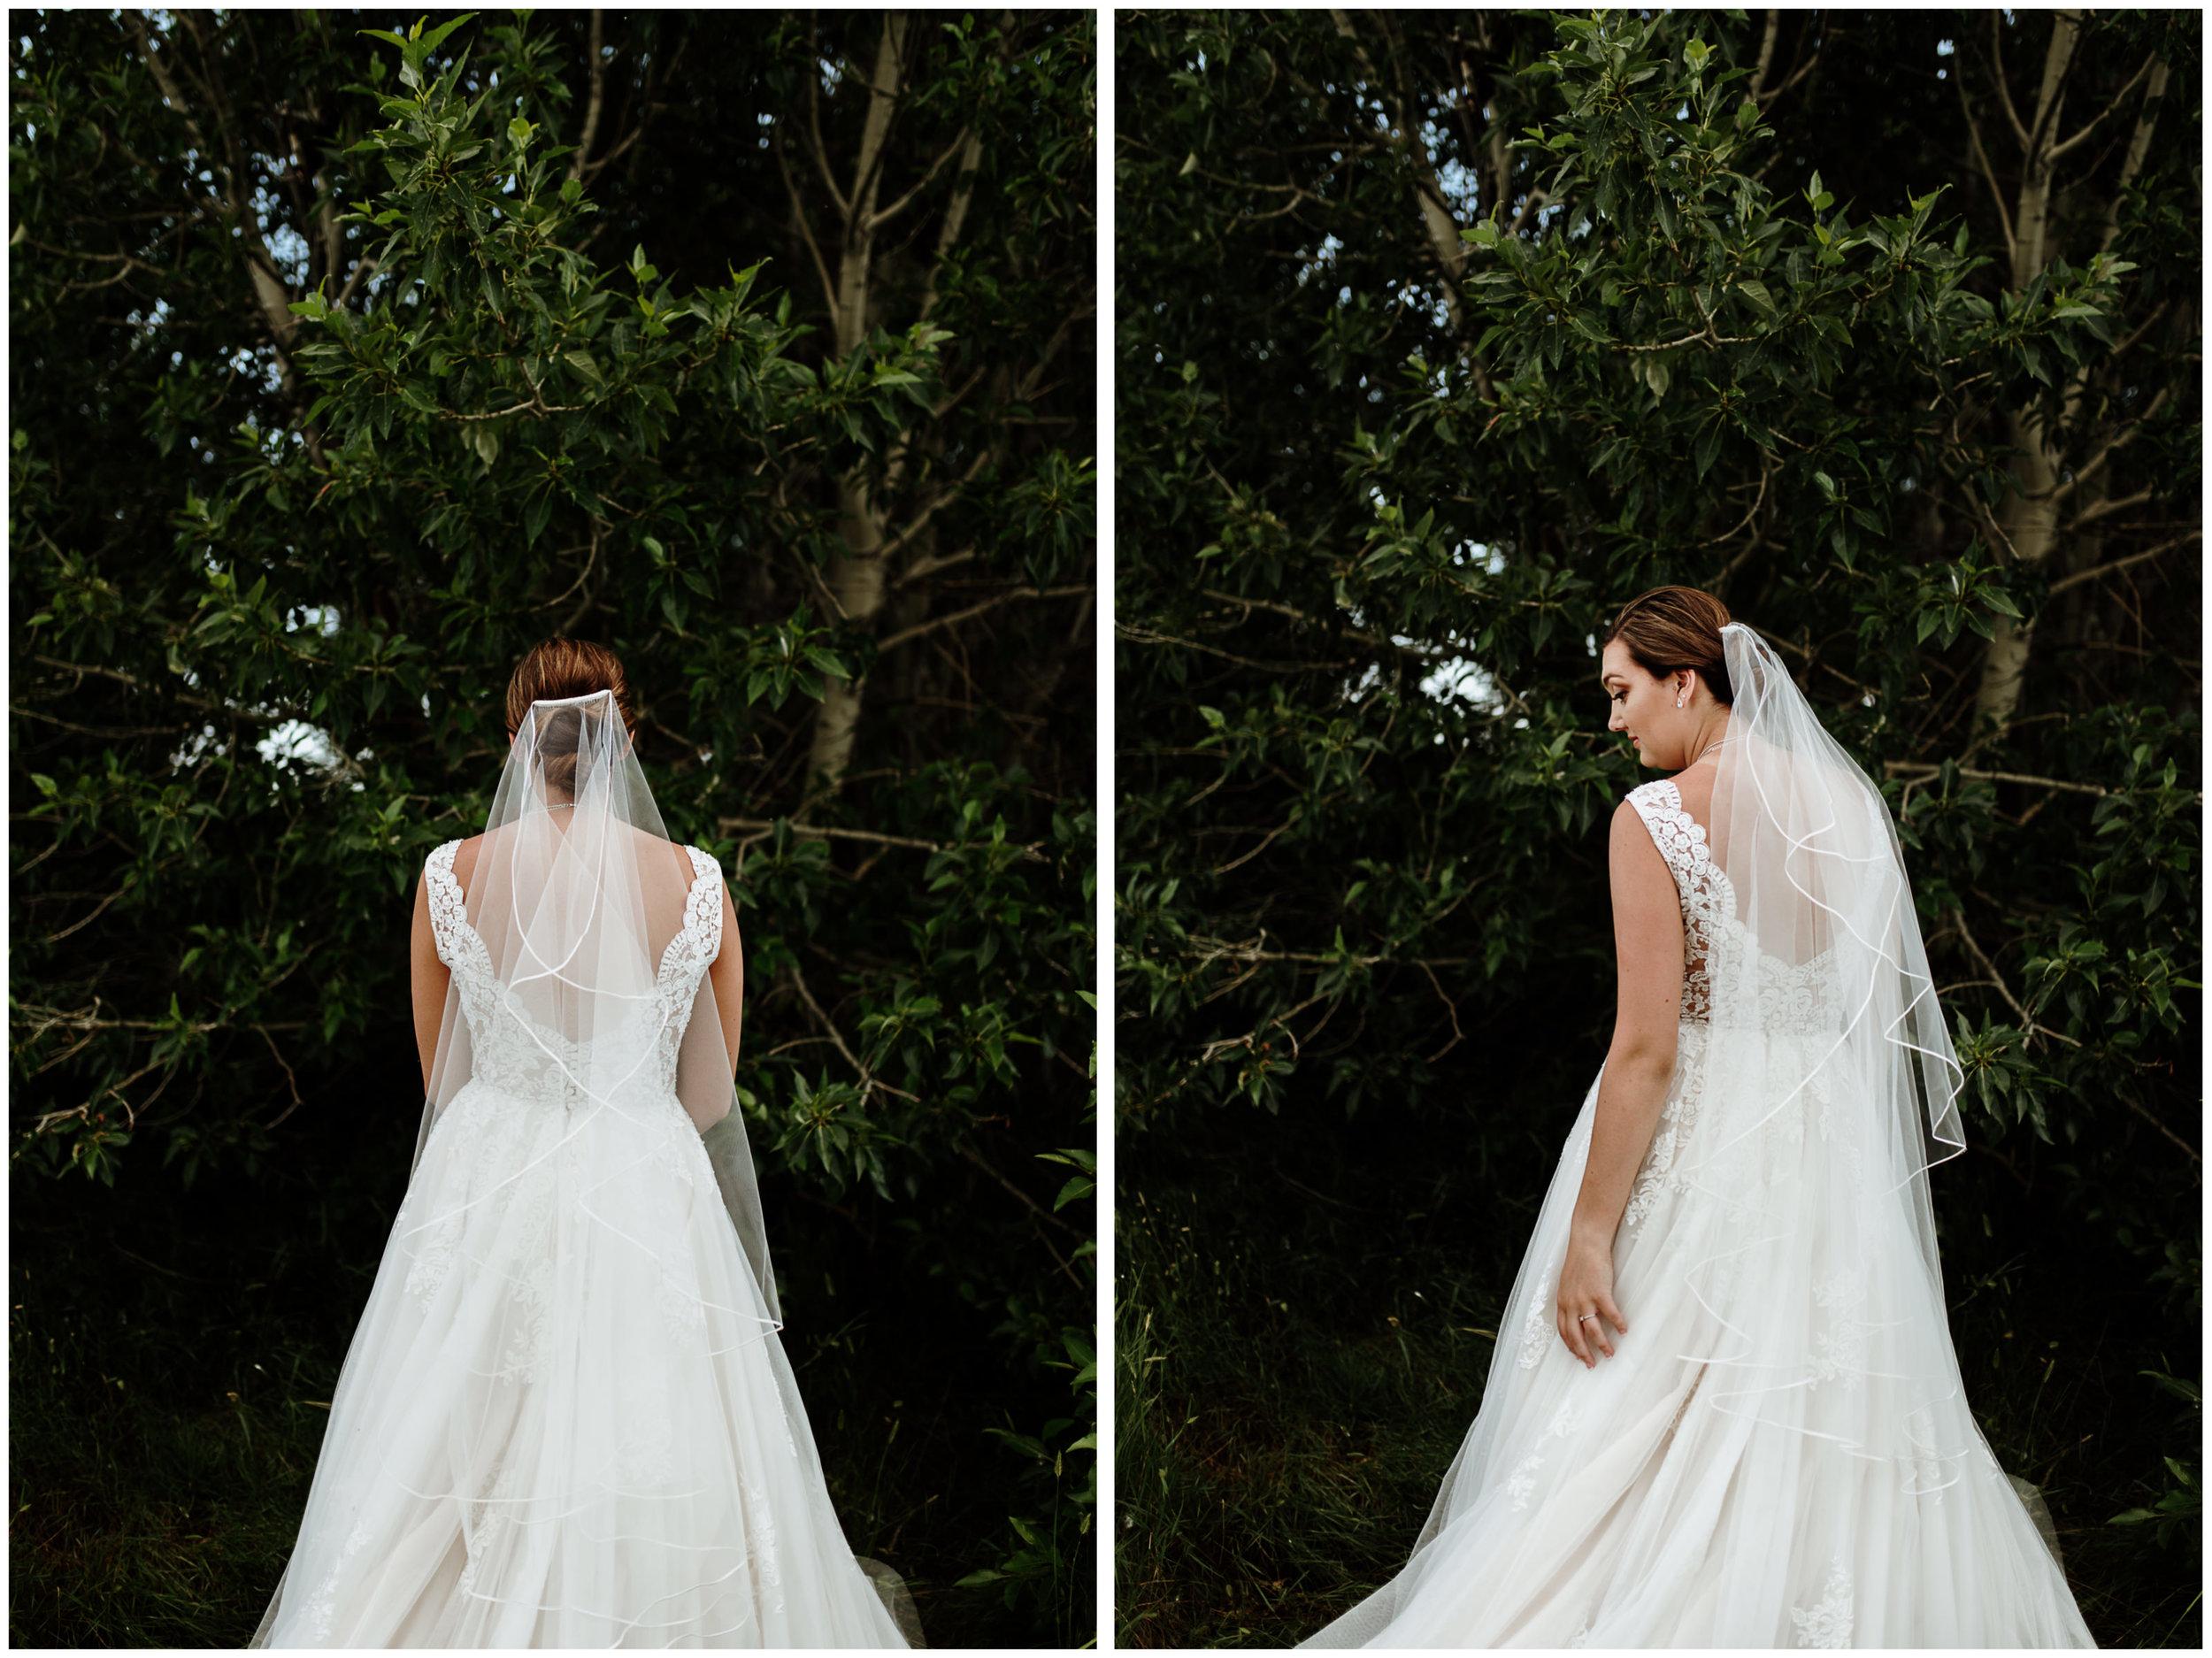 malia_clint_valier_rural_wedding_p18.jpg